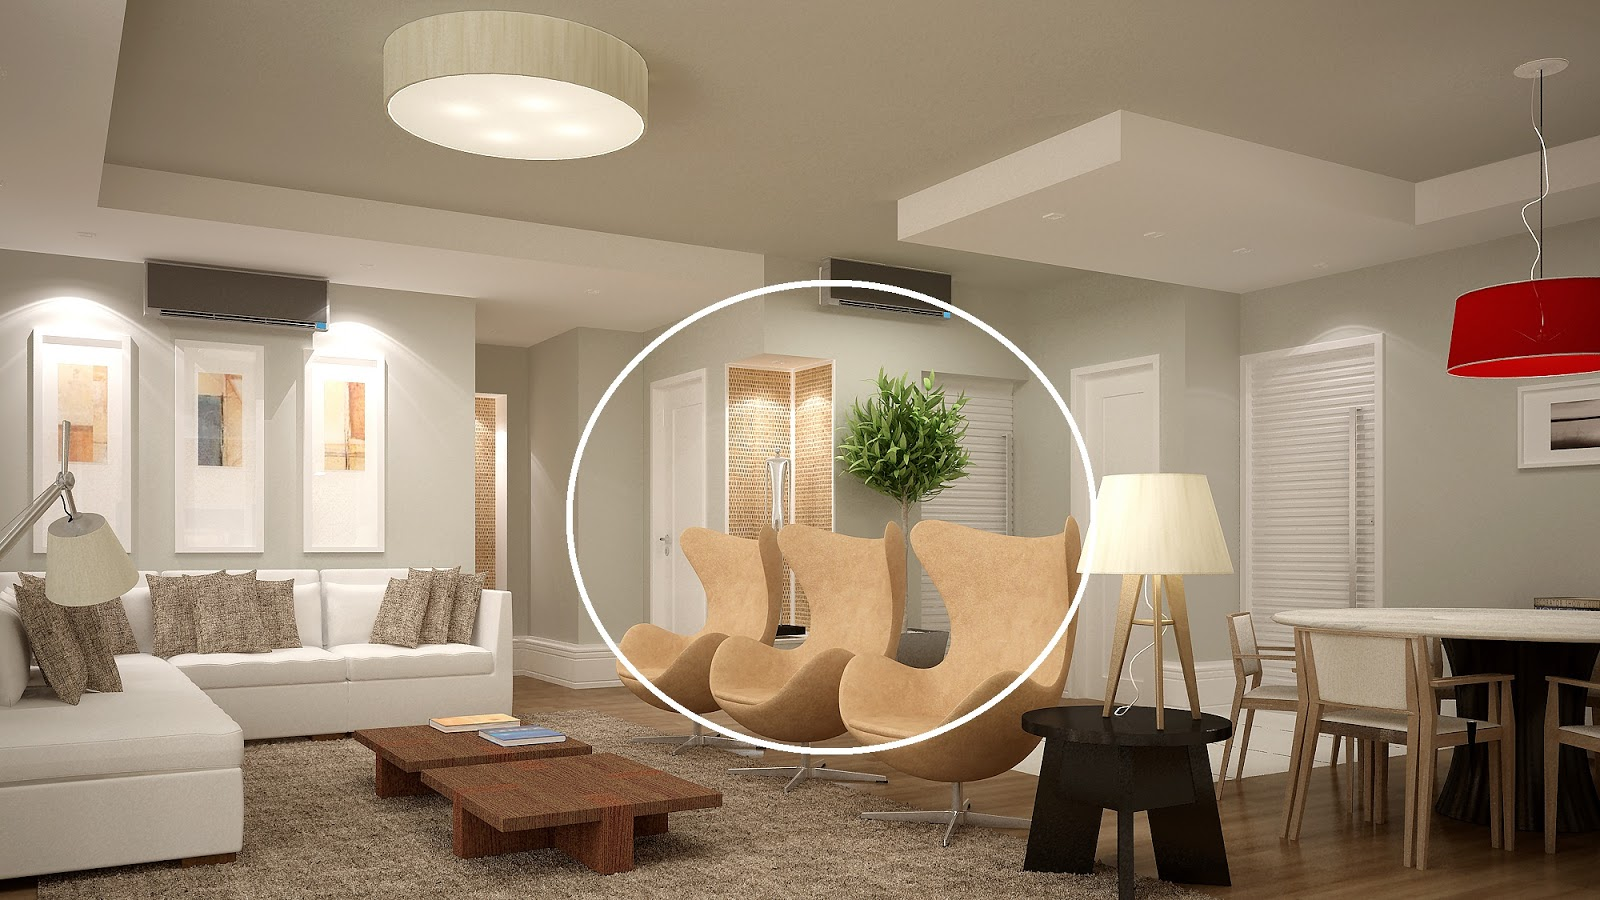 decorcad a8 planta base modificando paredes e inserindo hachuras aulascad. Black Bedroom Furniture Sets. Home Design Ideas